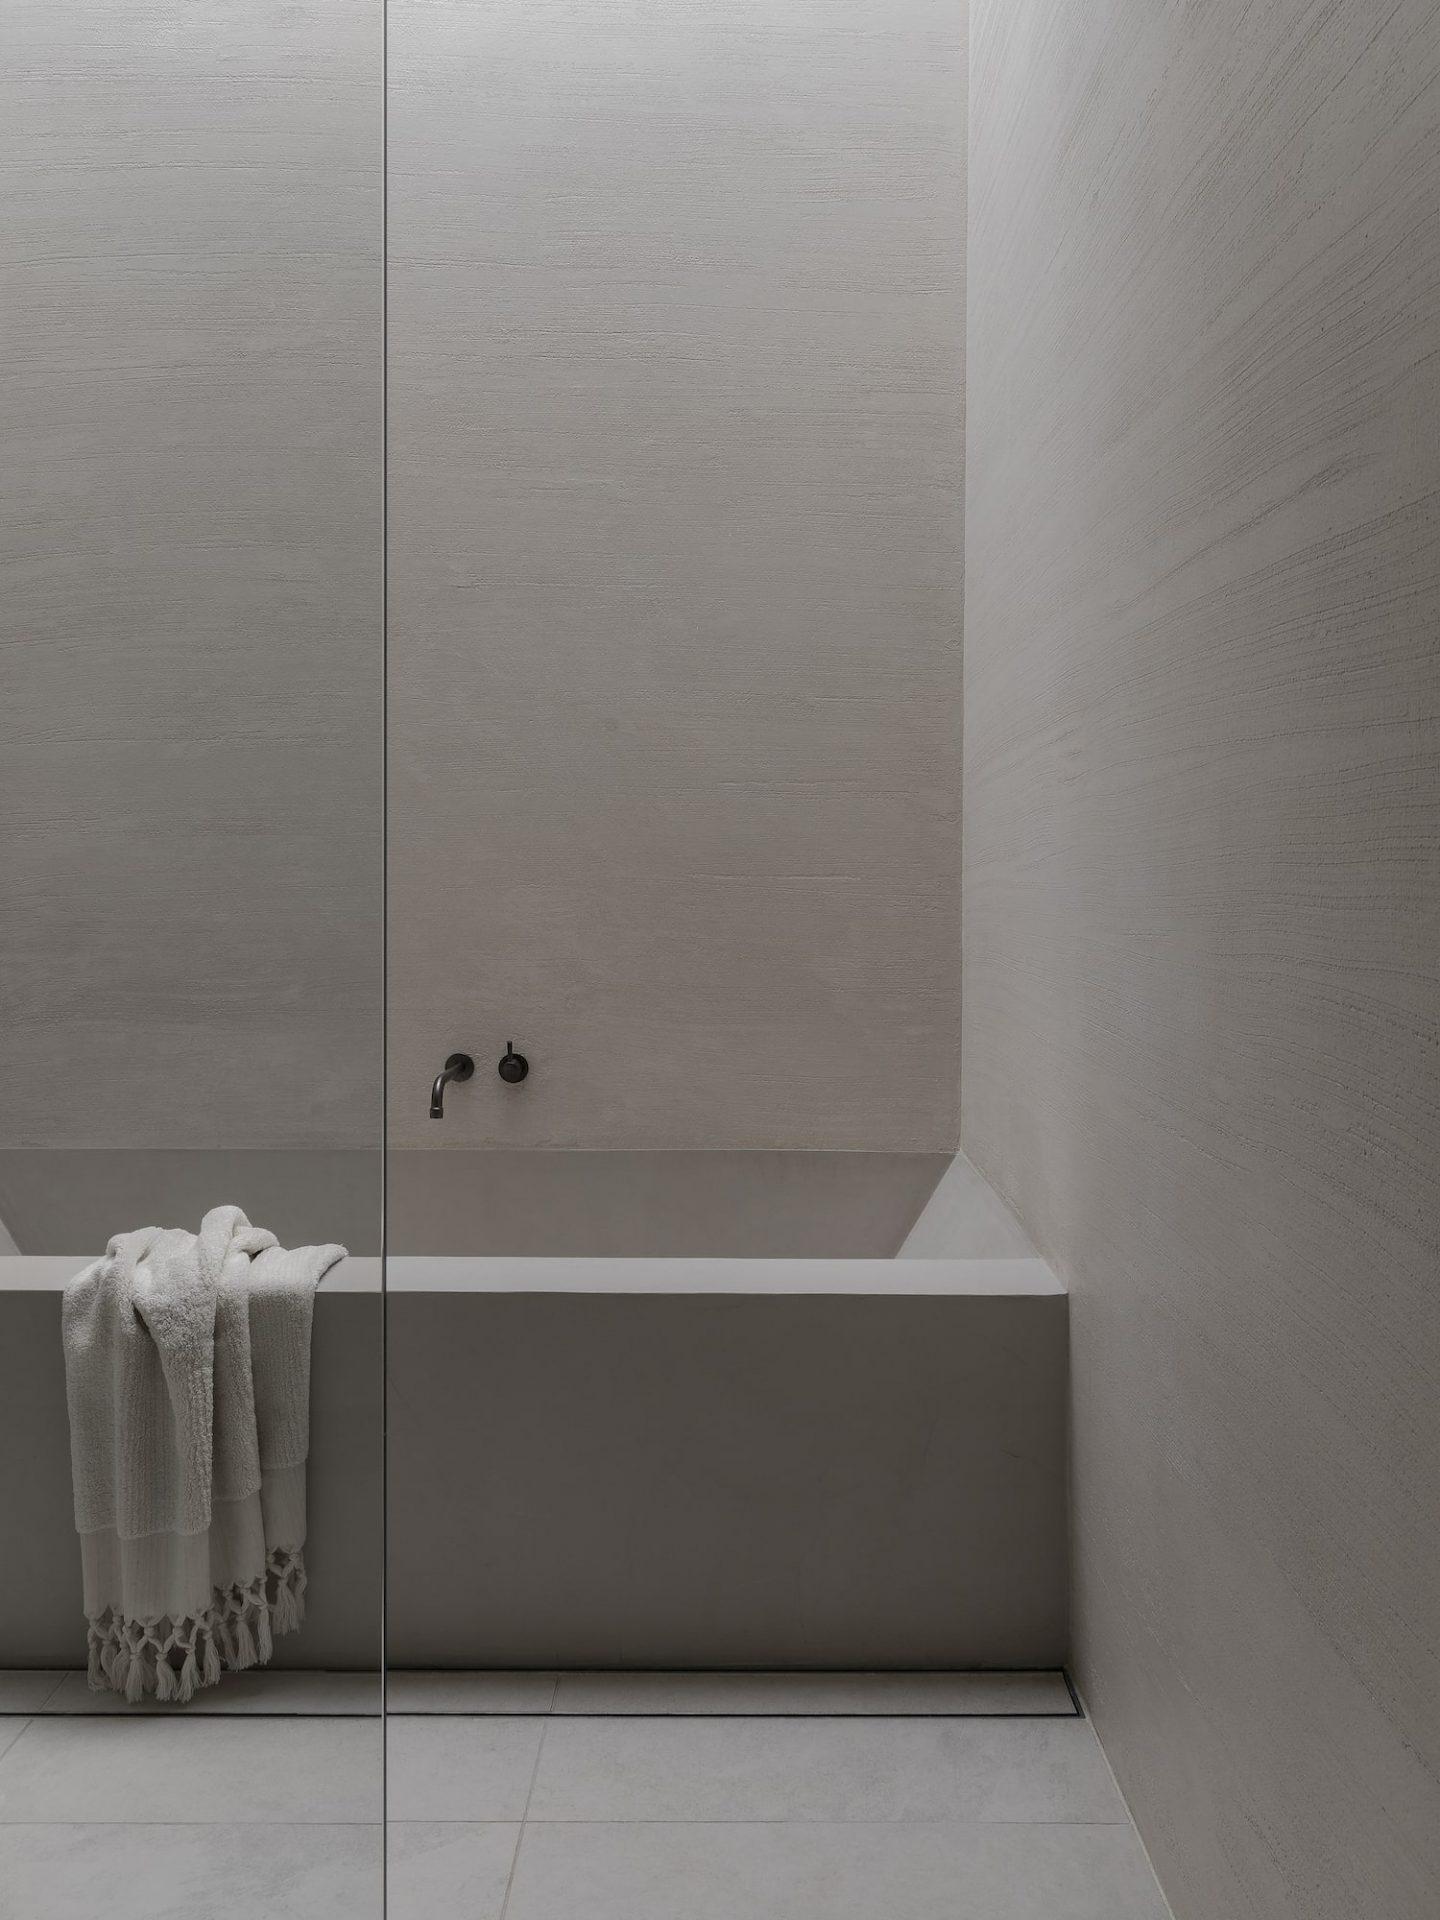 IGNANT-Architecture-Adam-Kane-Barwon-Heads-06-min